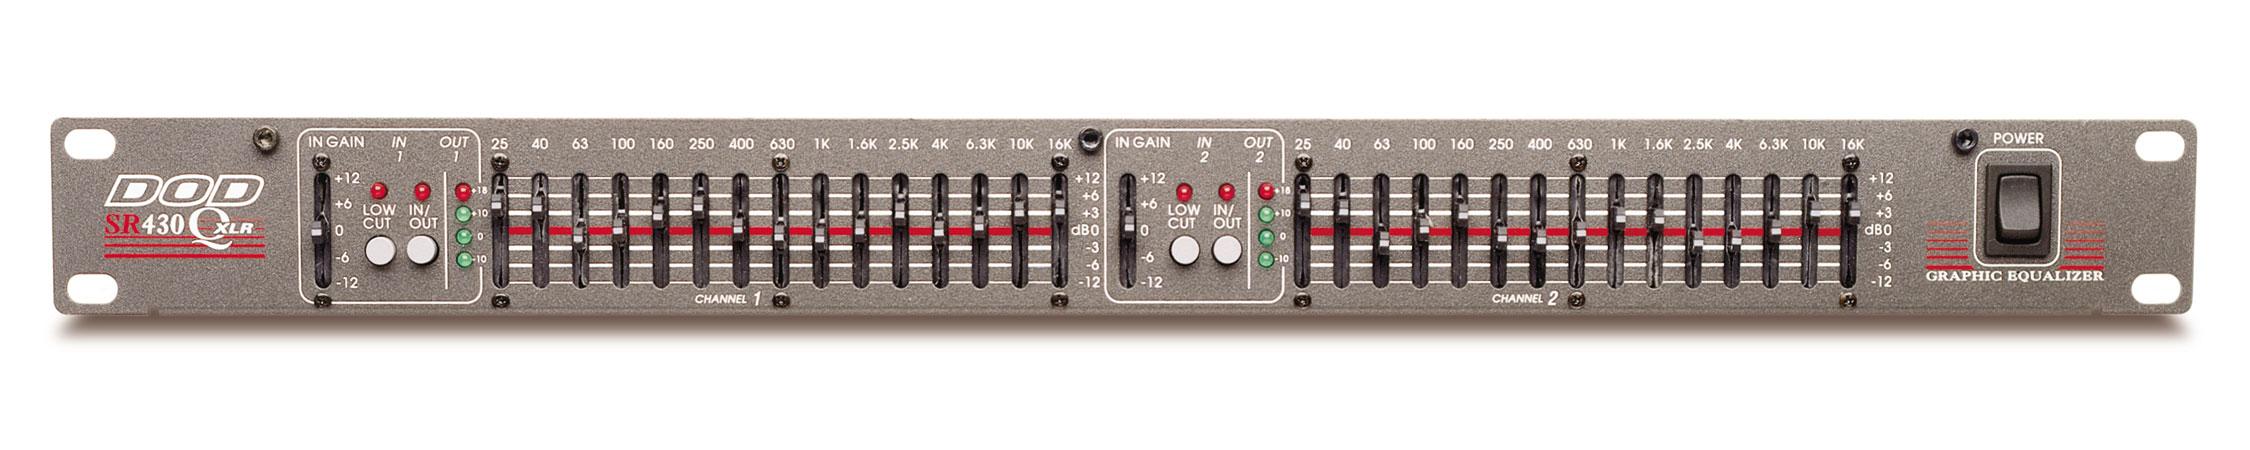 Sr430qxlr Dod 5 Band Equalizer Circuit Diagram Sr430 Tiny Square